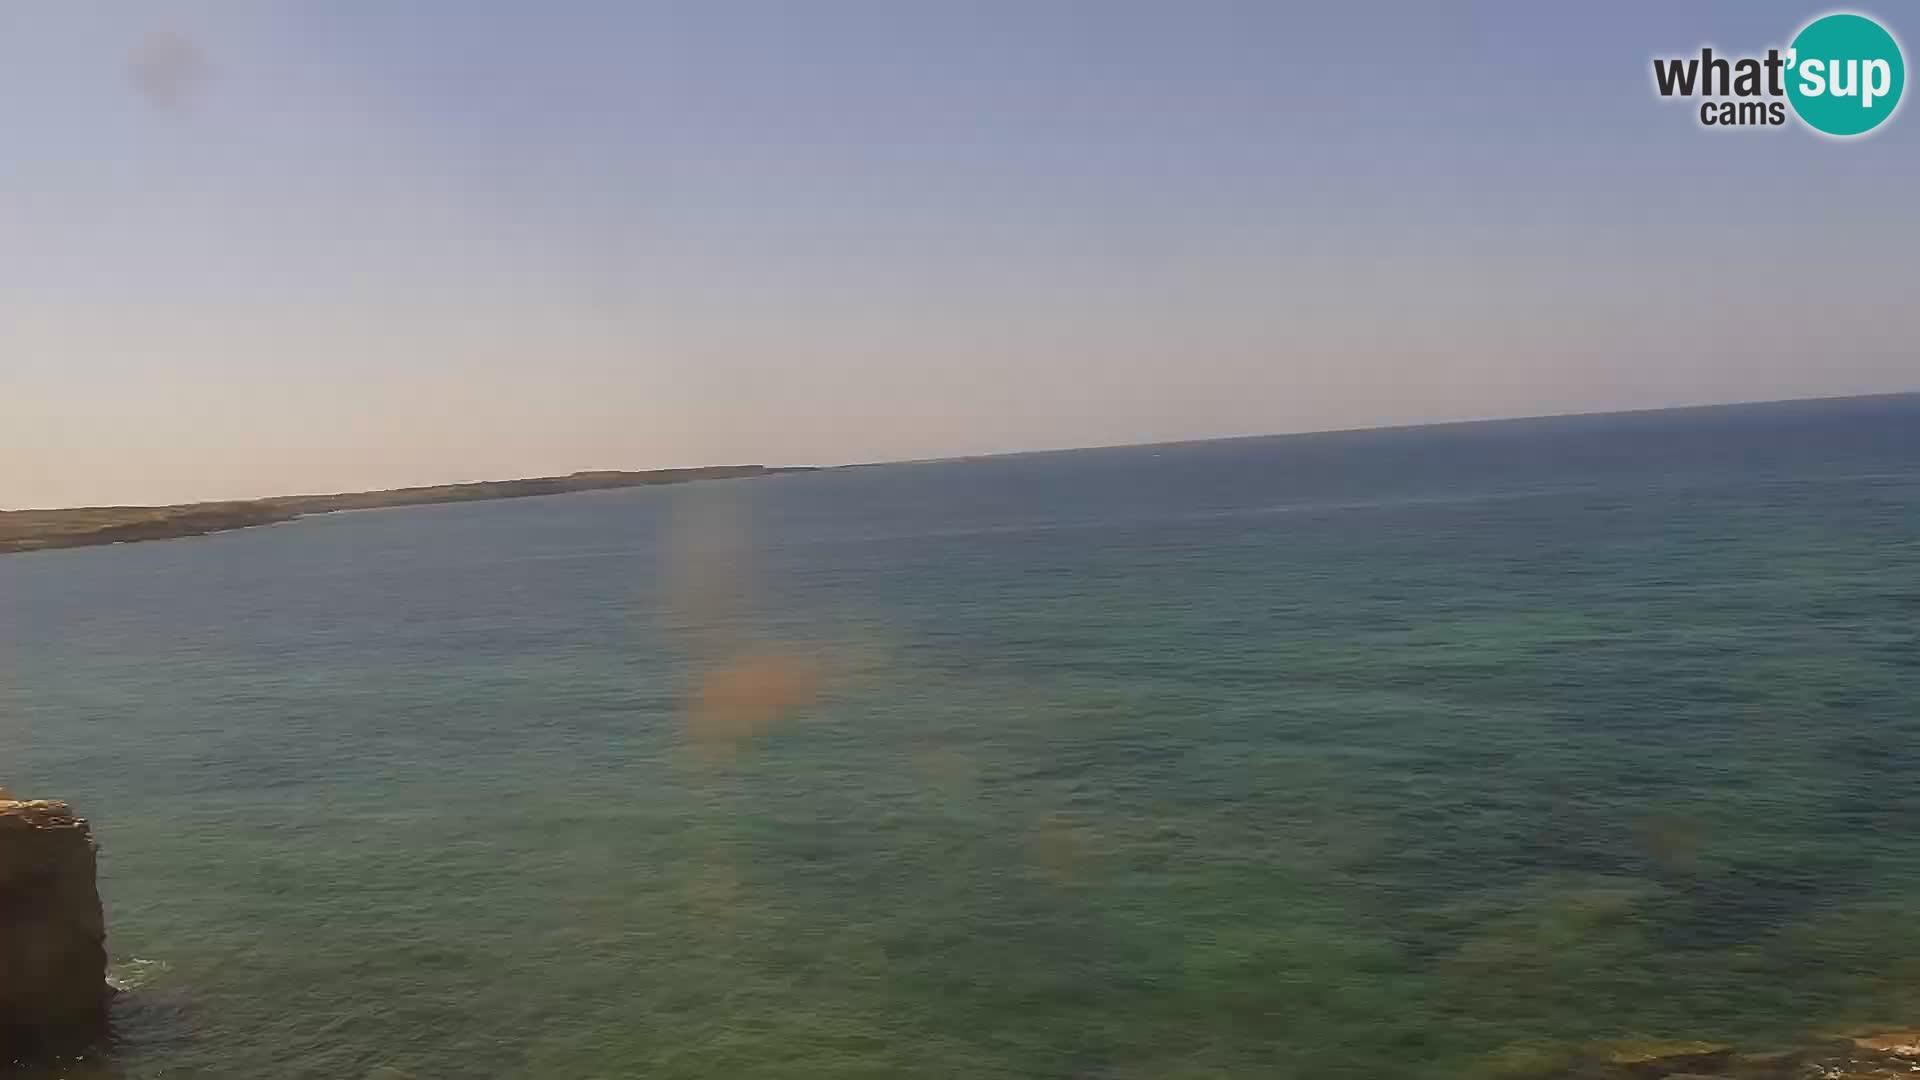 Webcam en direct Plage Putzu Idu – Arco di S'Architteddu – Oristano livecam Sardaigne – Italie